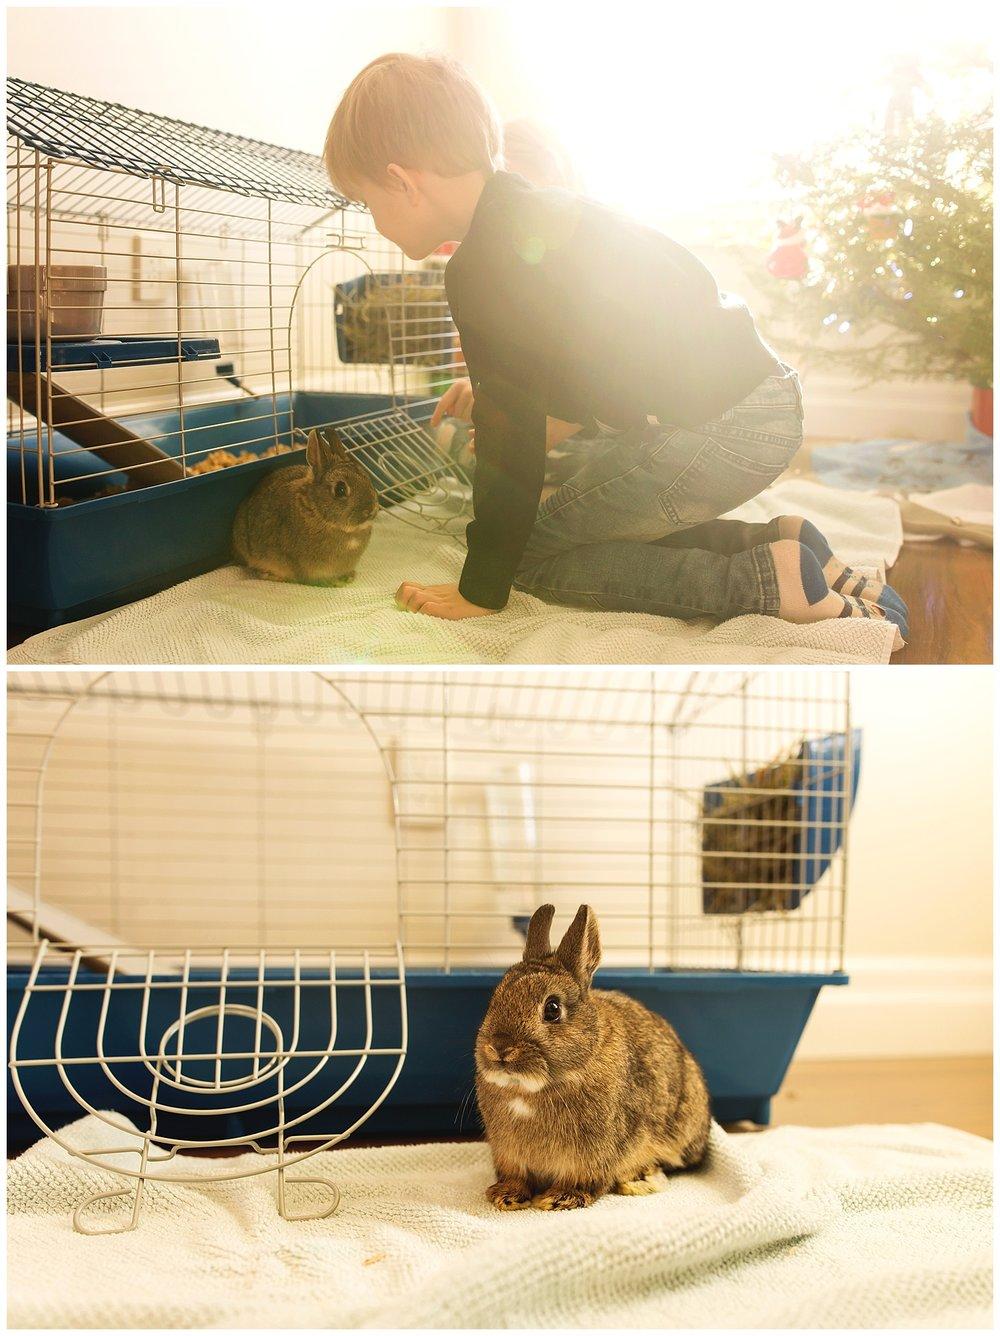 Pet Bunny.jpg